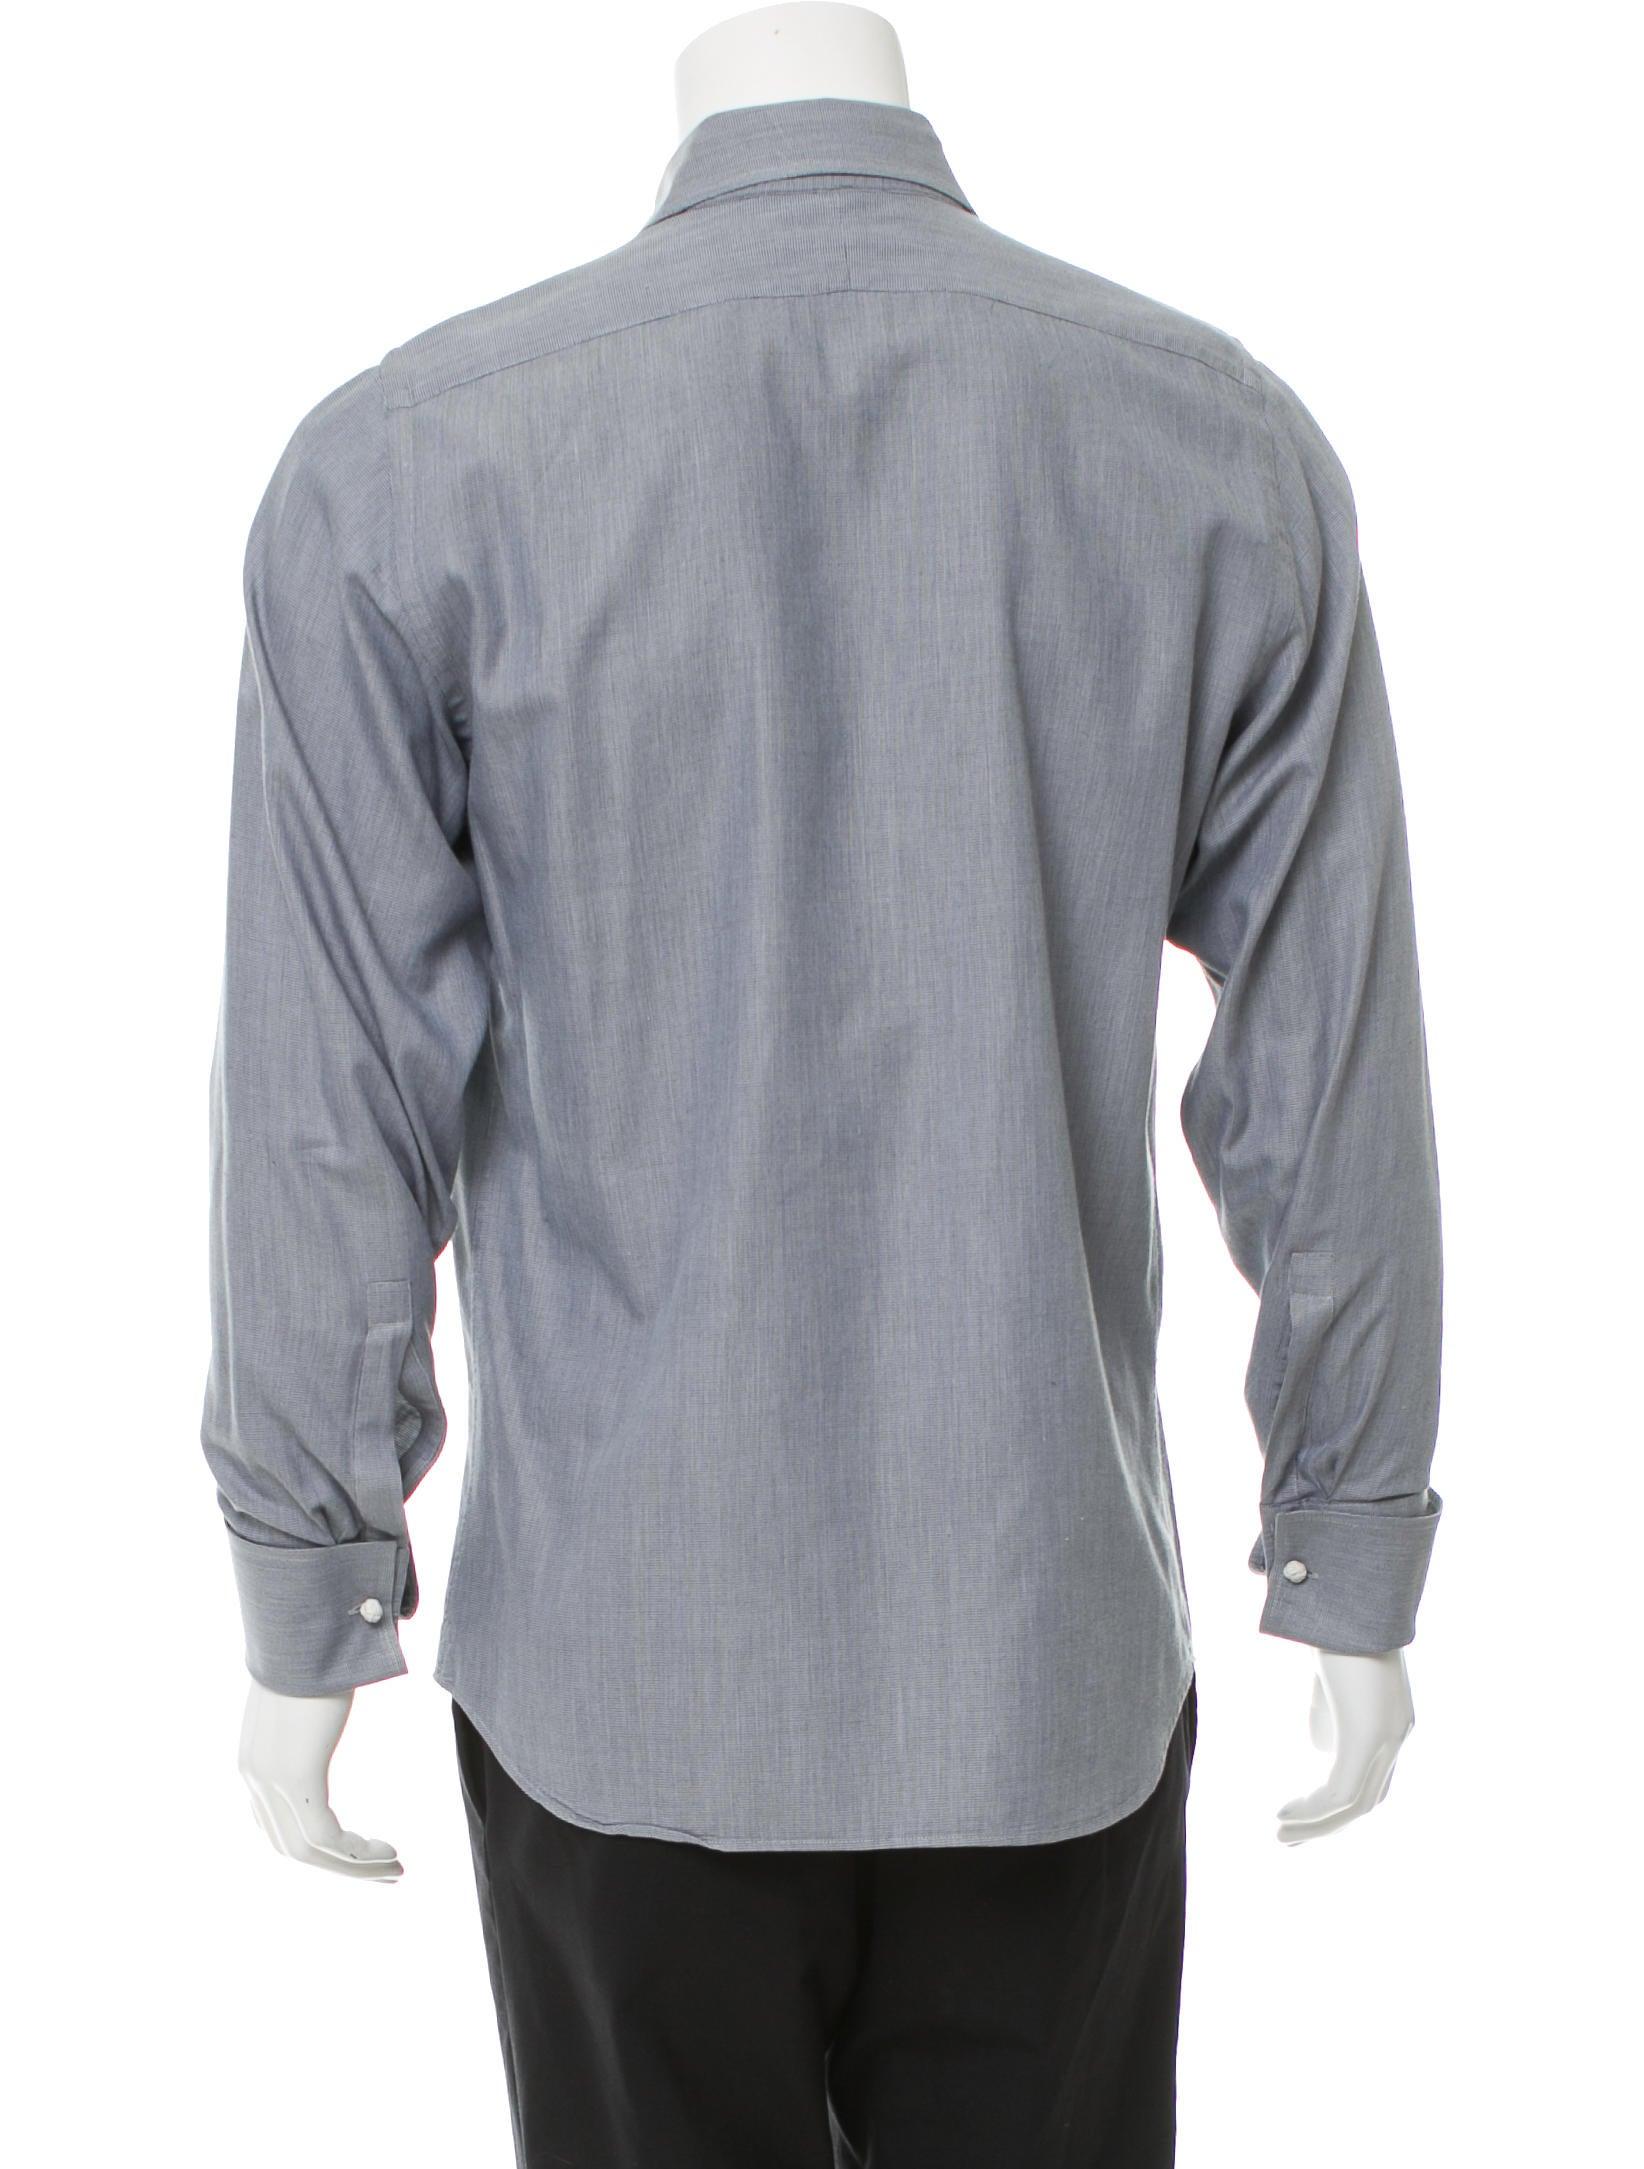 Prada french cuff button up shirt clothing pra159502 for Pin collar shirt double cuff